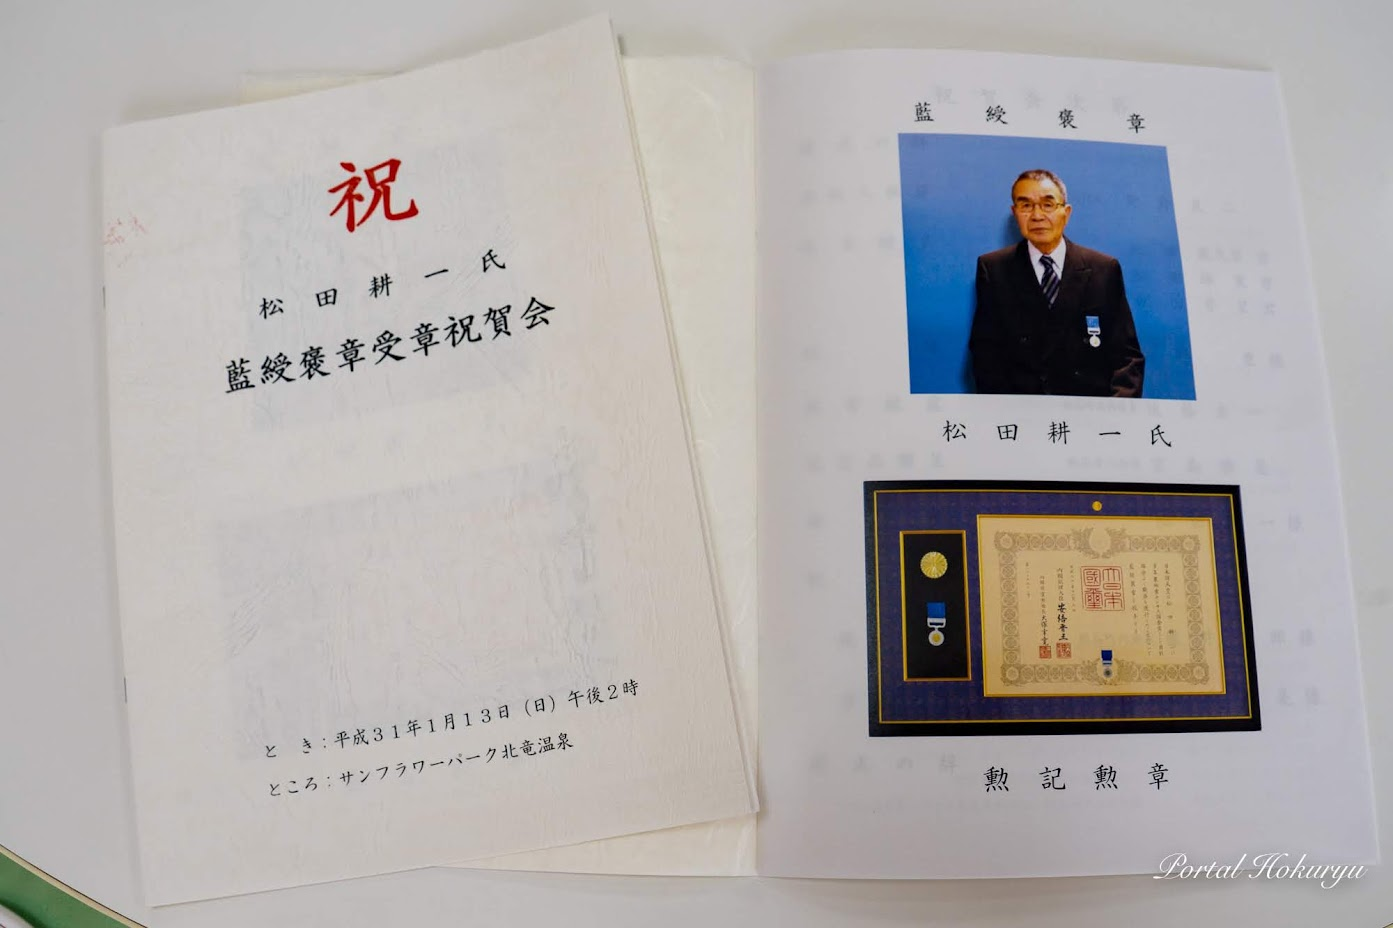 松田耕一氏・藍綬褒章受賞祝賀会プログラム